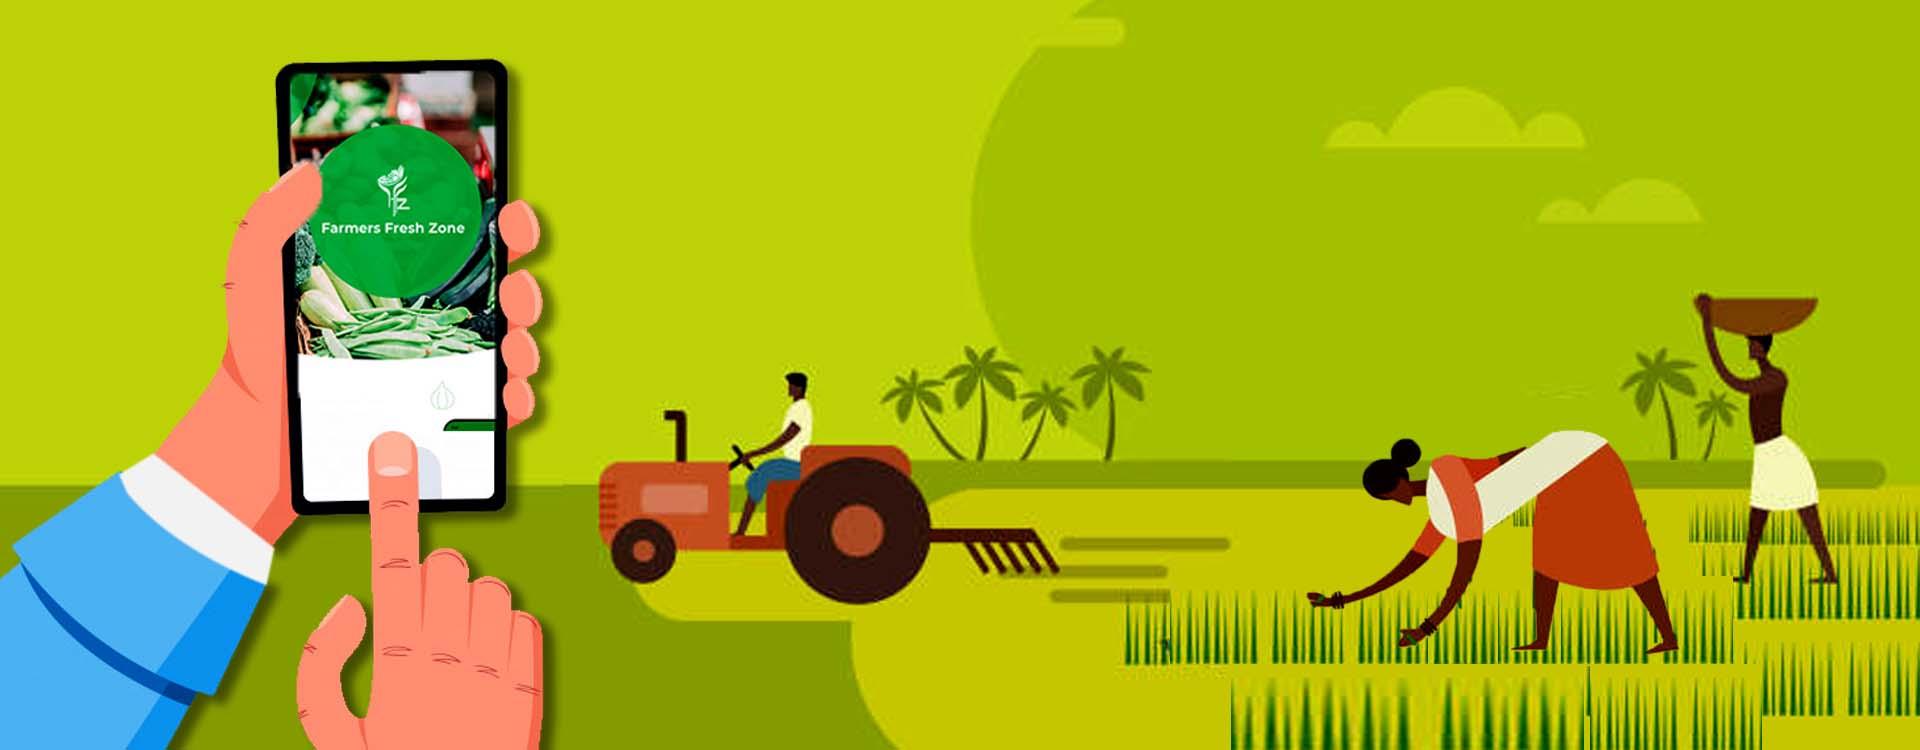 Agritech Startups like Farmersfz make farmers reach urban customers